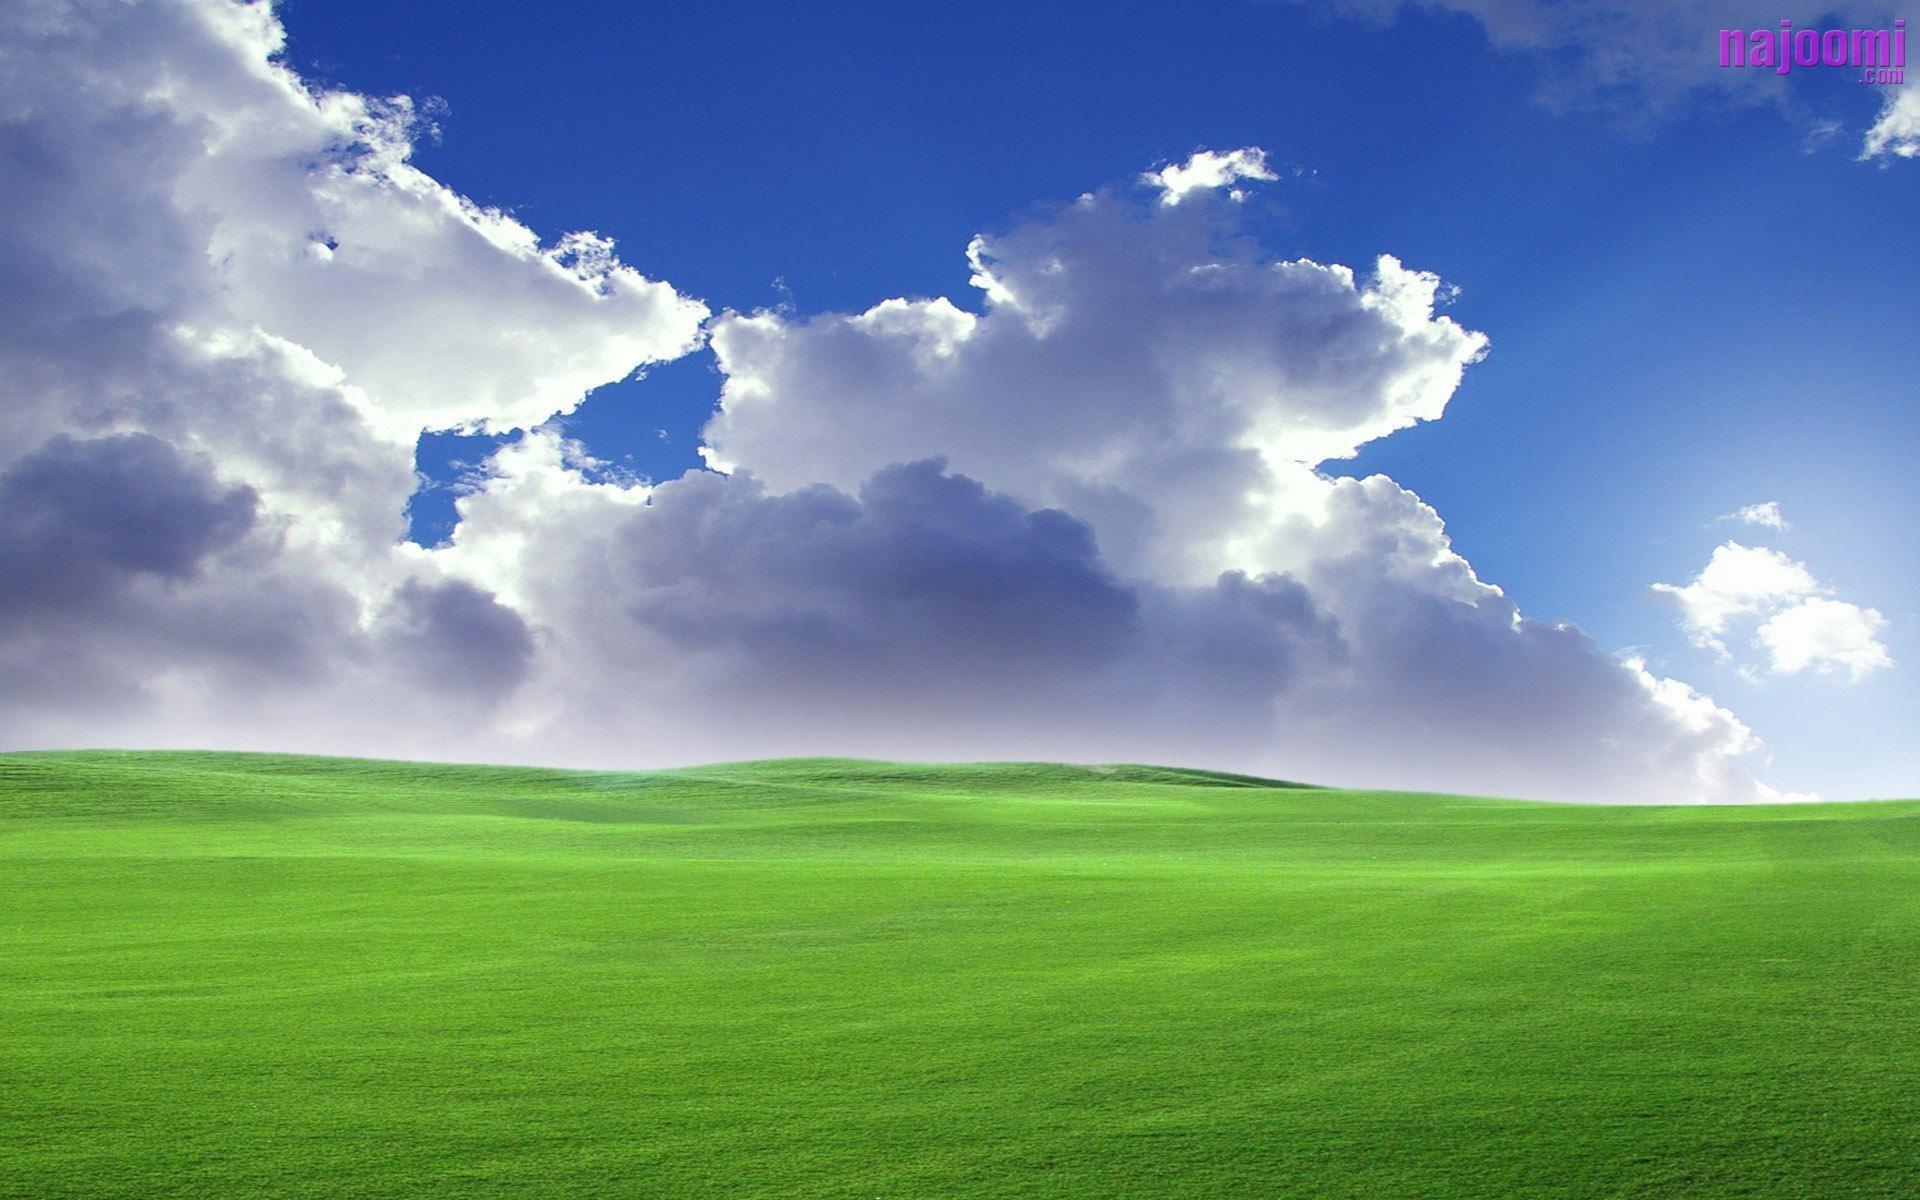 Windows xp desktop backgrounds 43 images - Windows wallpaper themes free ...